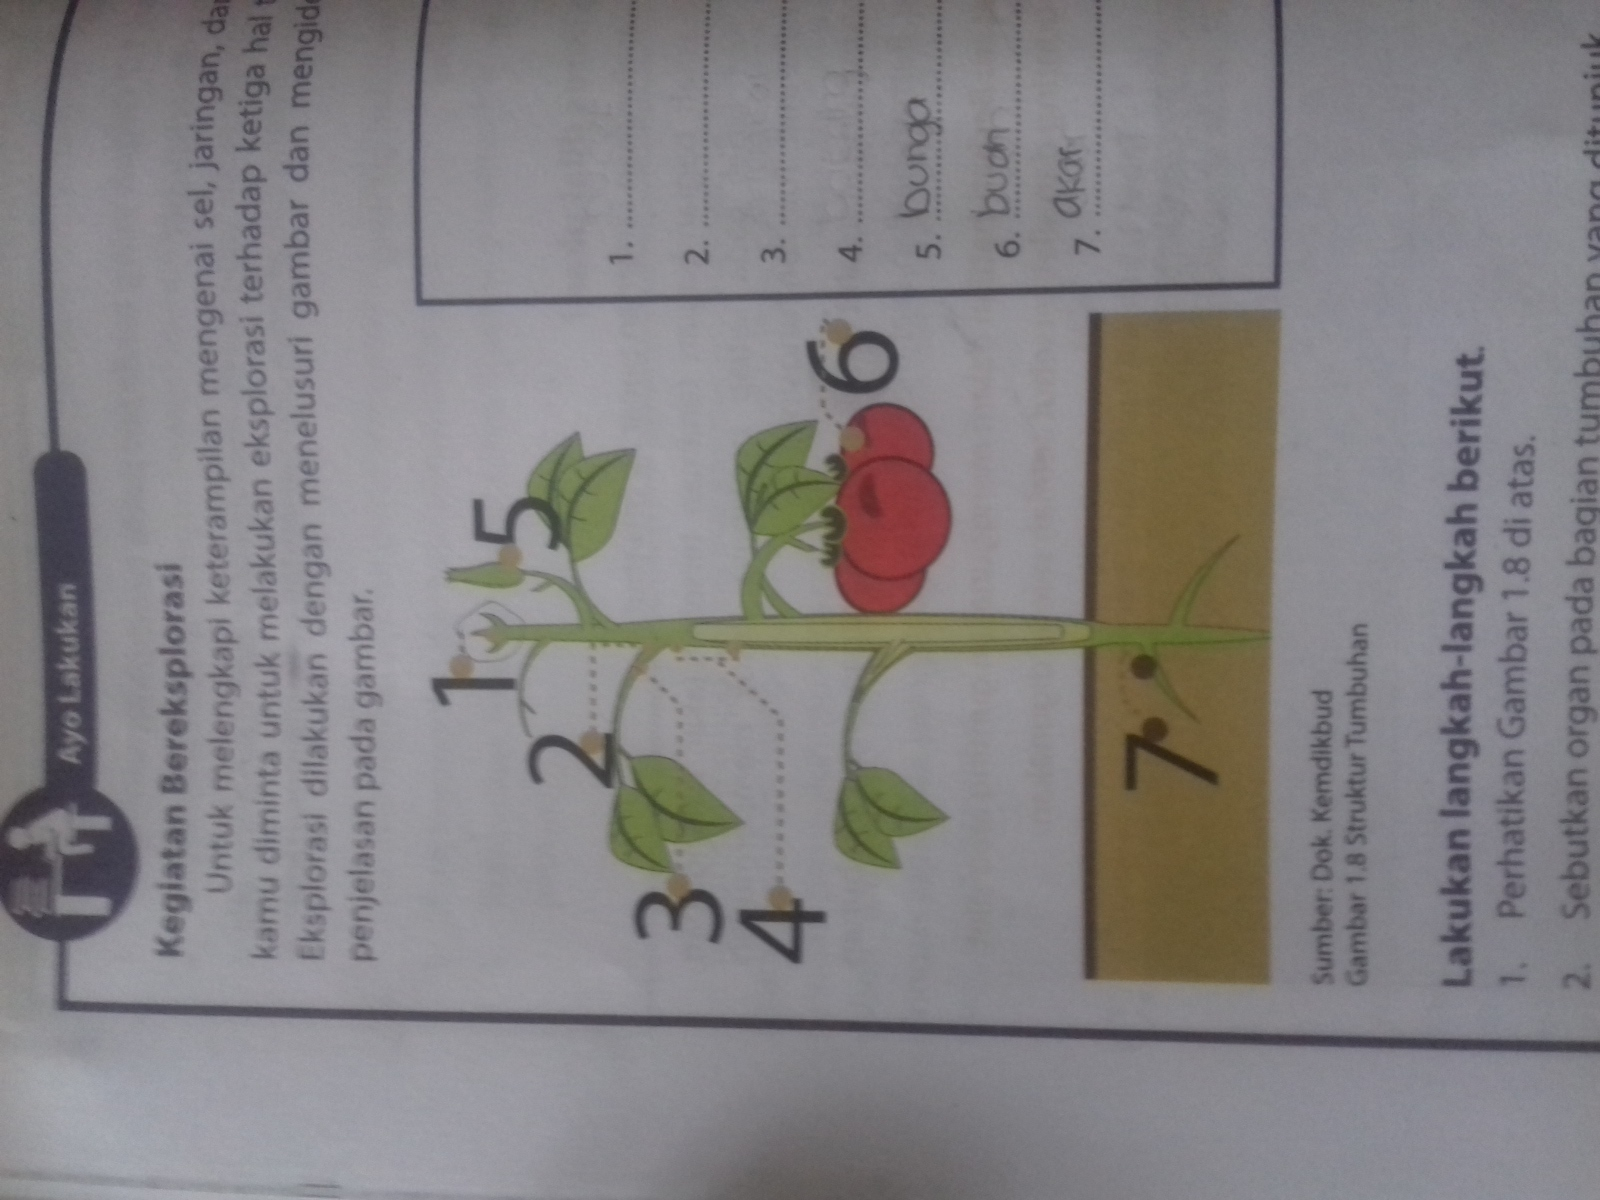 struktur tumbuhan tomat beserta fungsinya. - Brainly.co.id